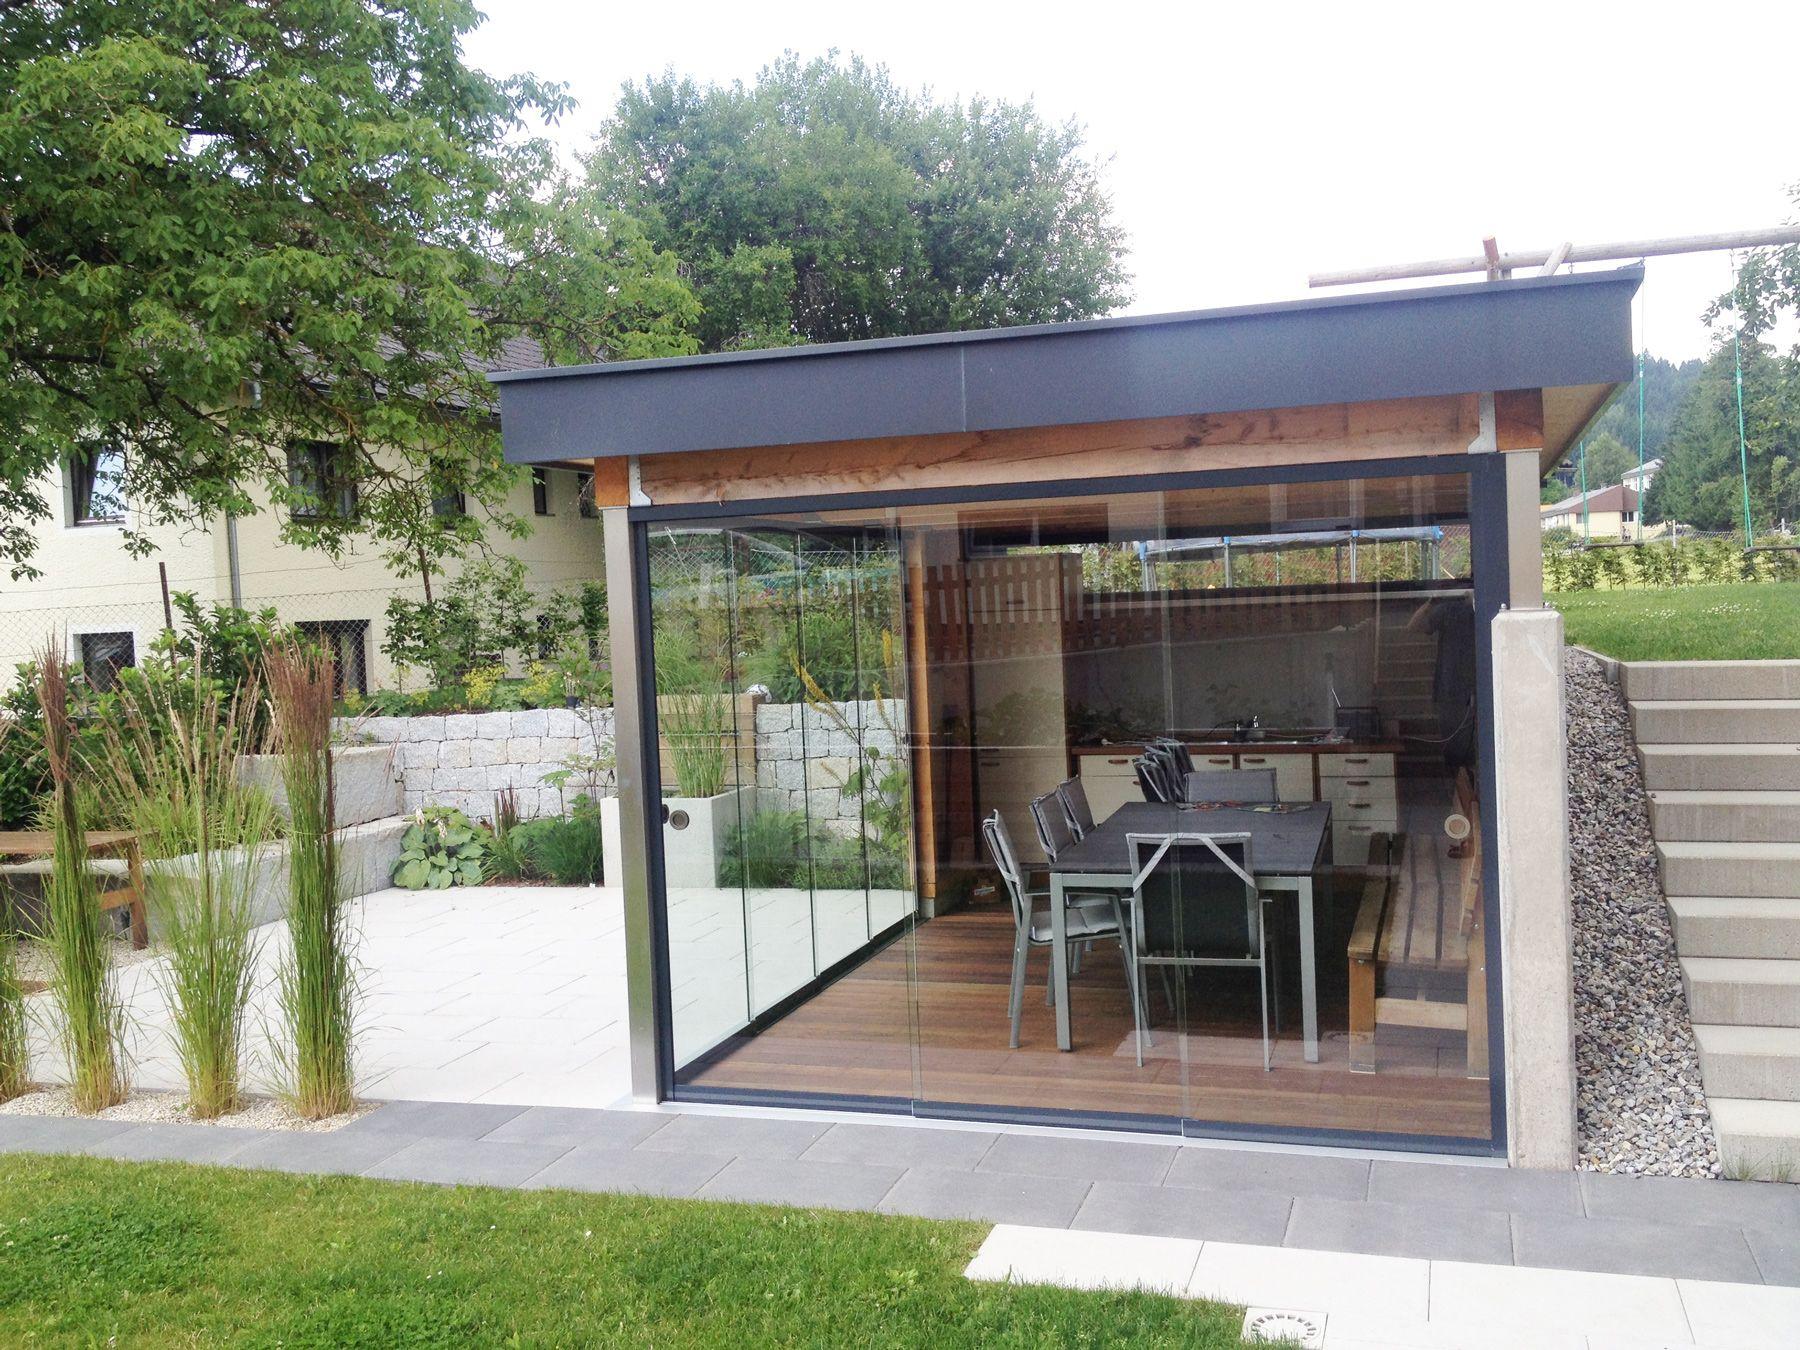 Gartenlaube mit glasschiebet ren verglasen wintergarten pinterest doors sliding doors und - Bundesverband wintergarten ev ...